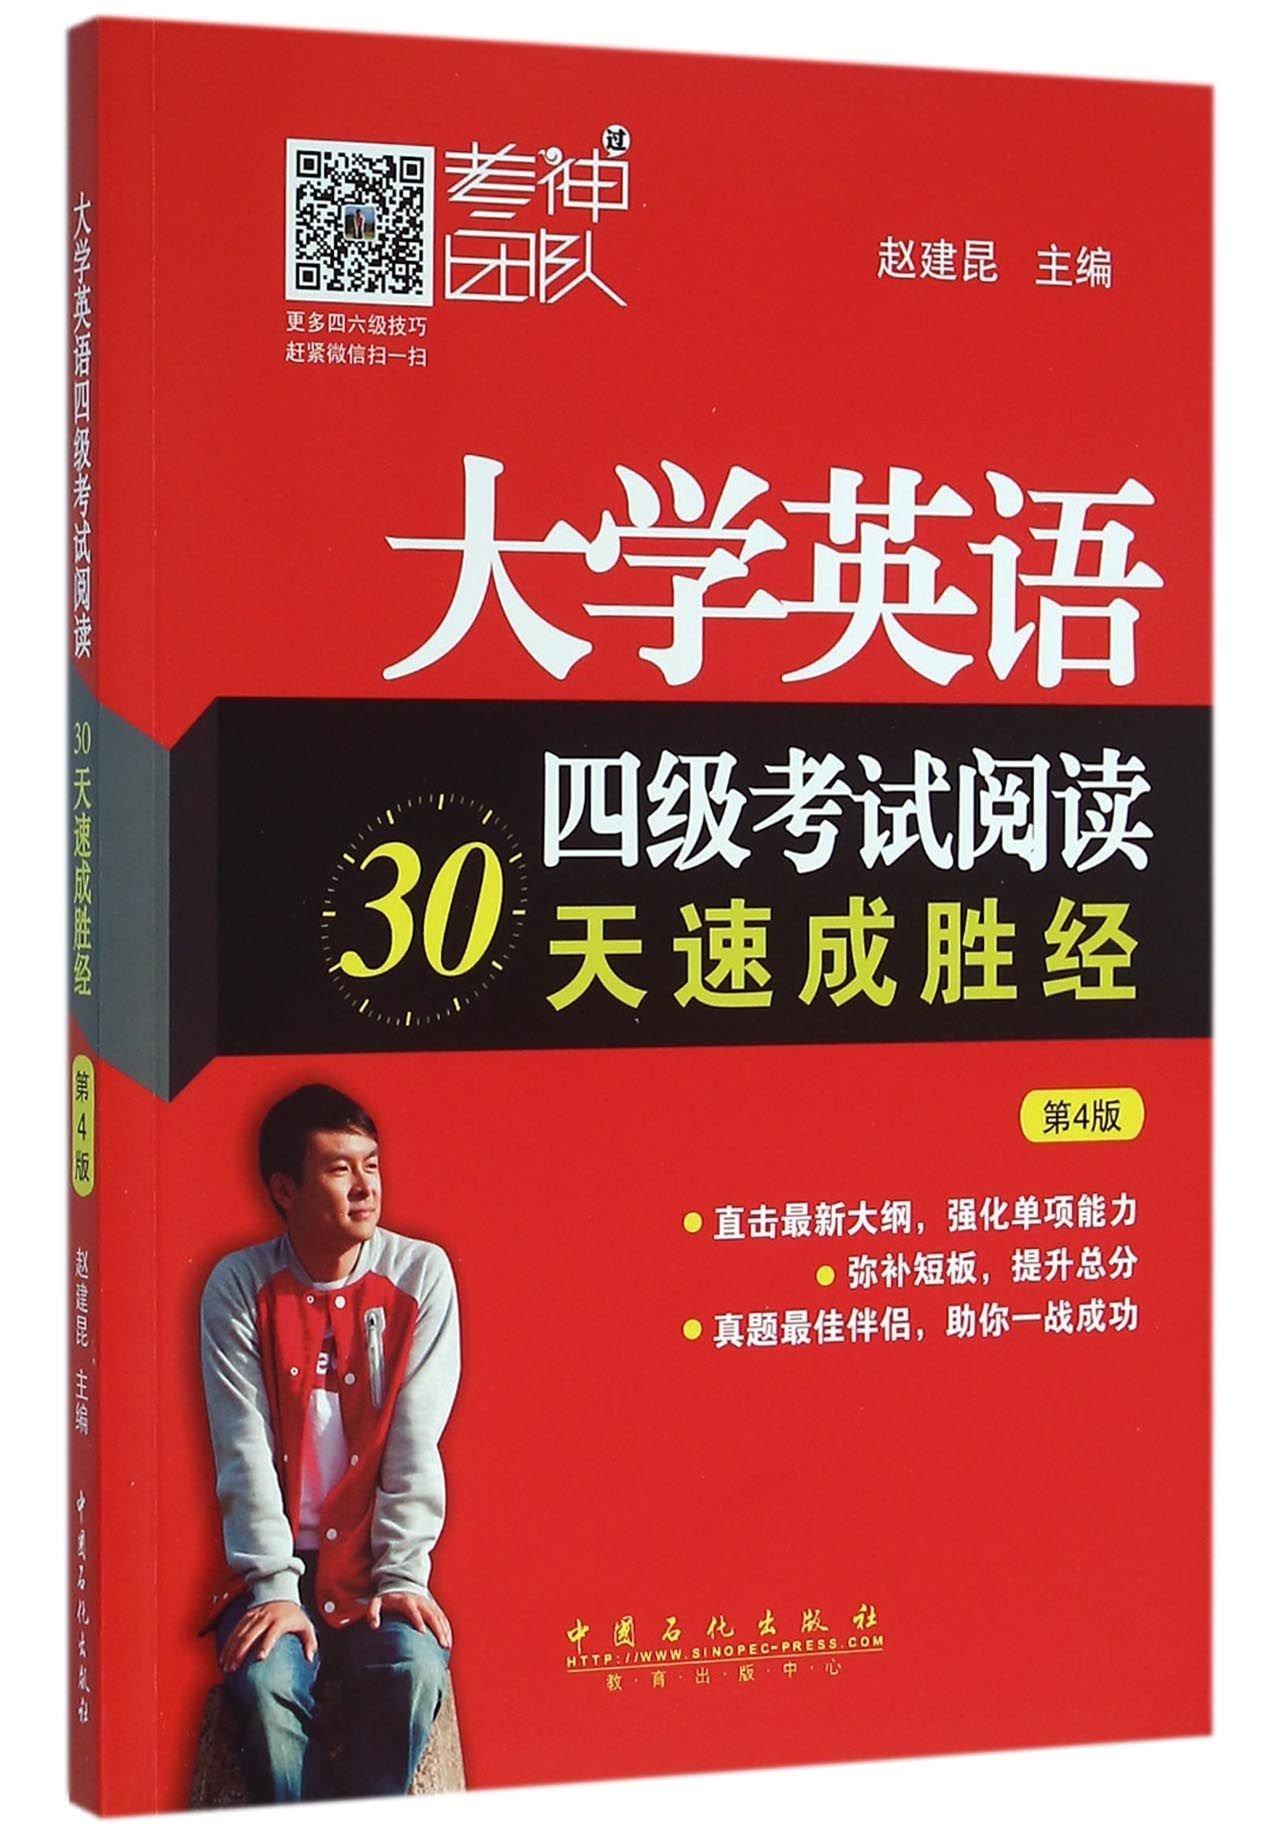 Download 大学英语四级考试阅读30天速成胜经(第4版) ebook